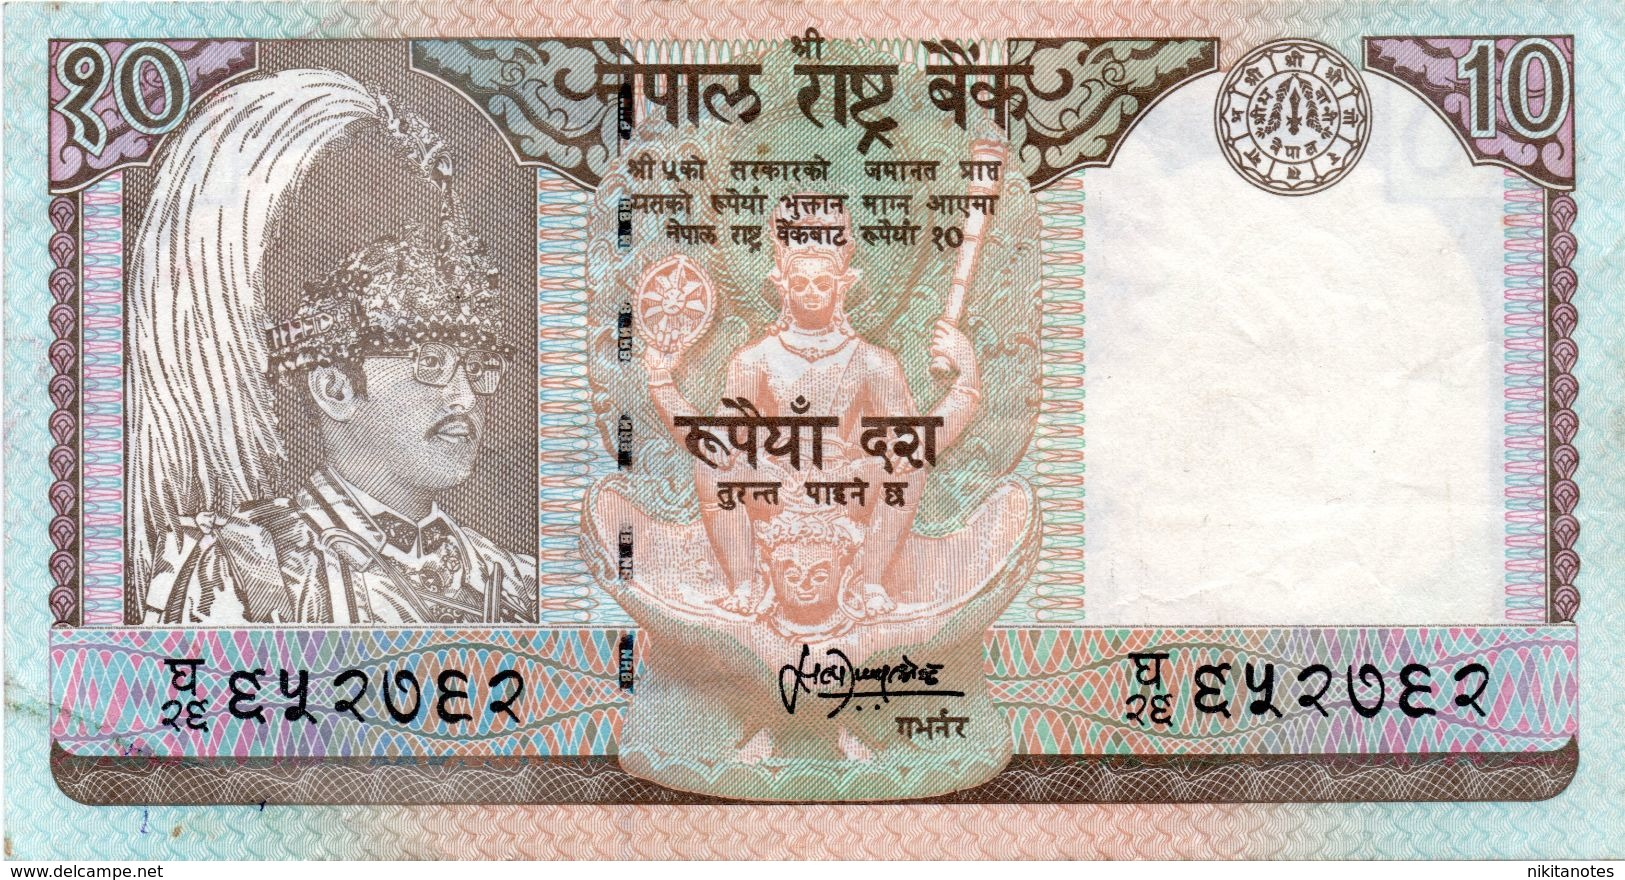 NEPAL 10 RUPEES P 31 Circ - Nepal